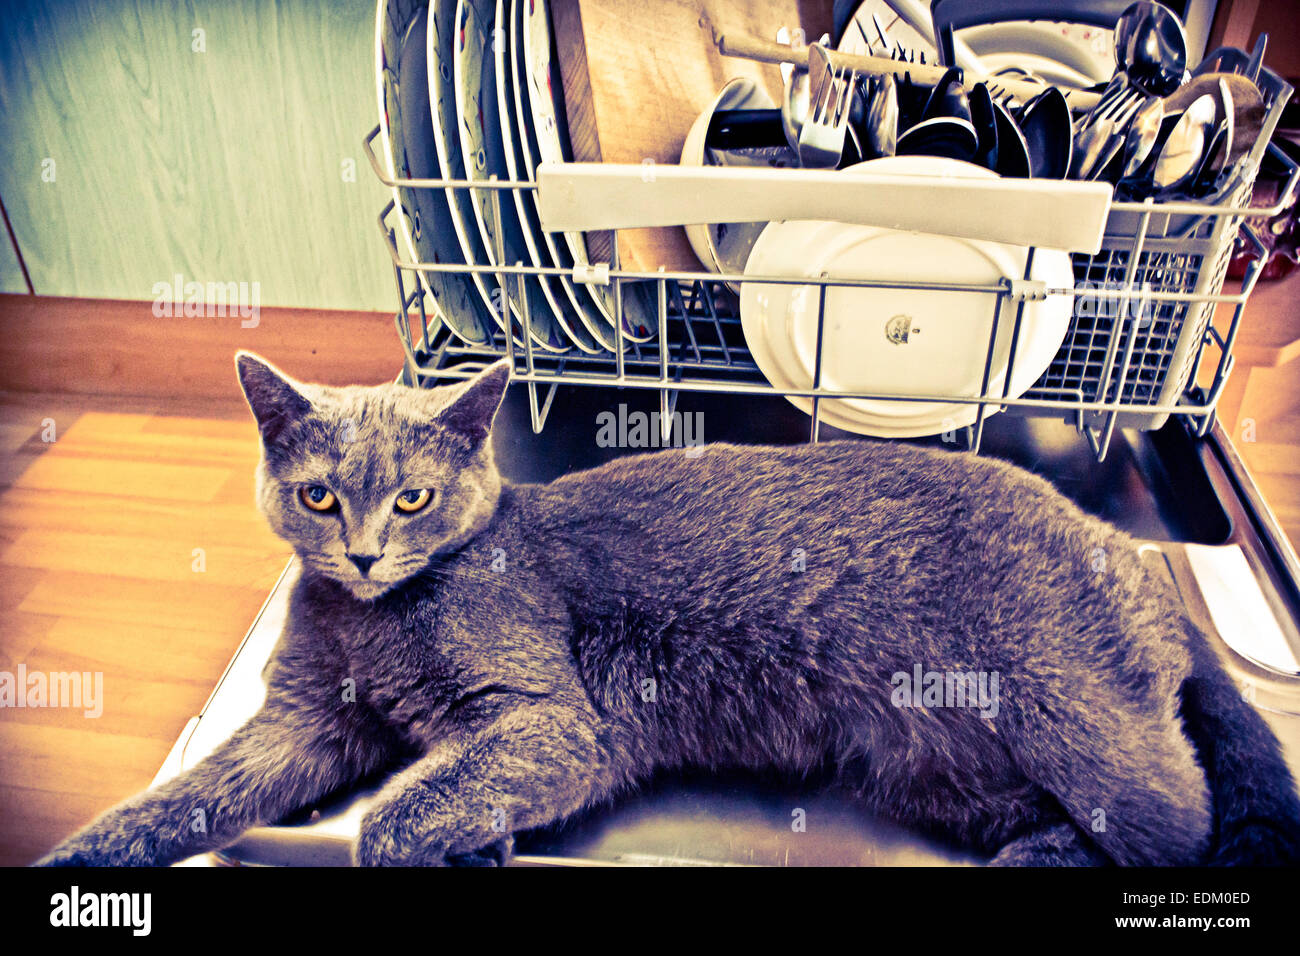 British gray cat resting on a washing machine door - Stock Image